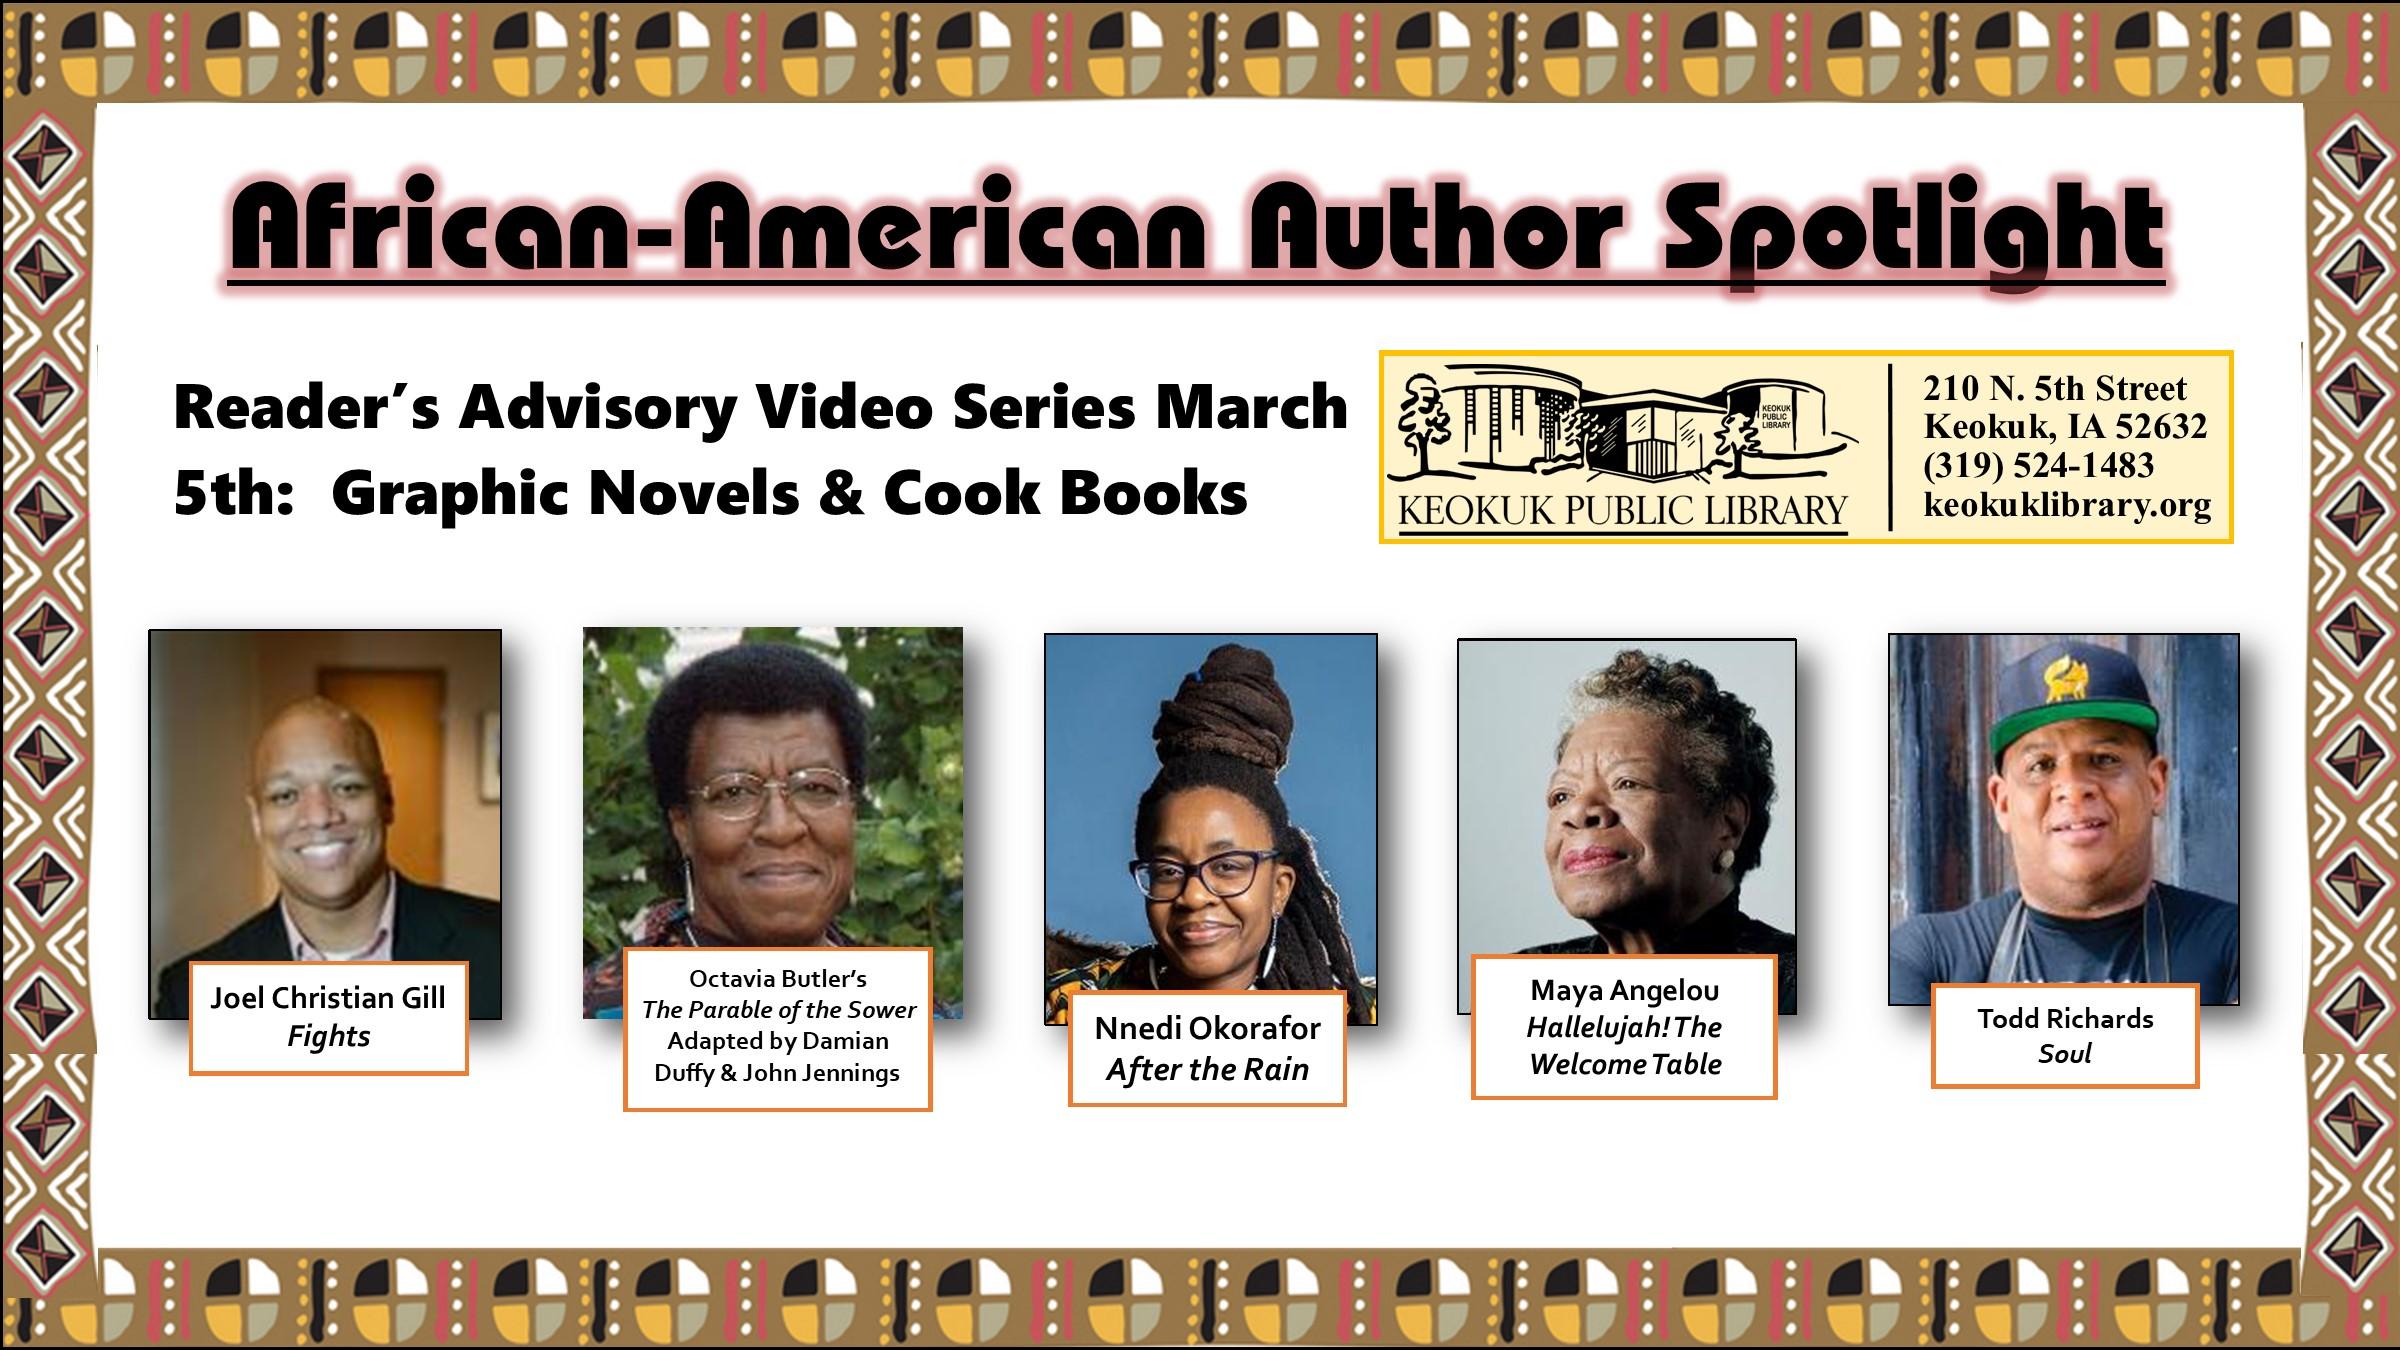 Reader's Advisory Video Series: Graphic Novels & Cookbooks